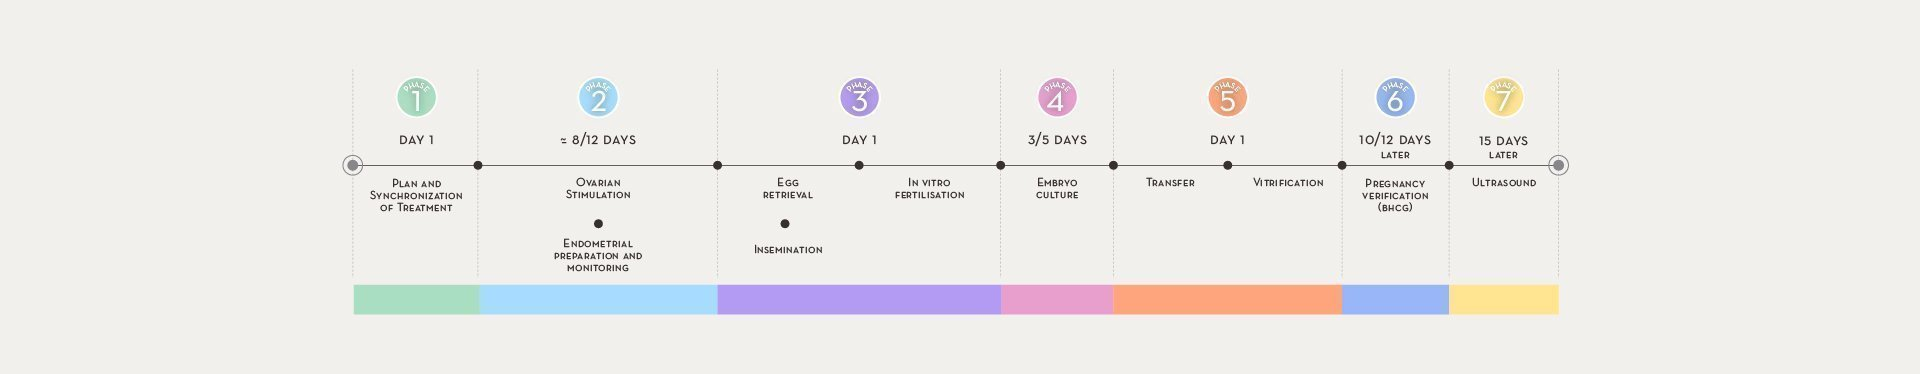 IVF: In Vitro Fertilization, treatments at Instituto Bernabeu